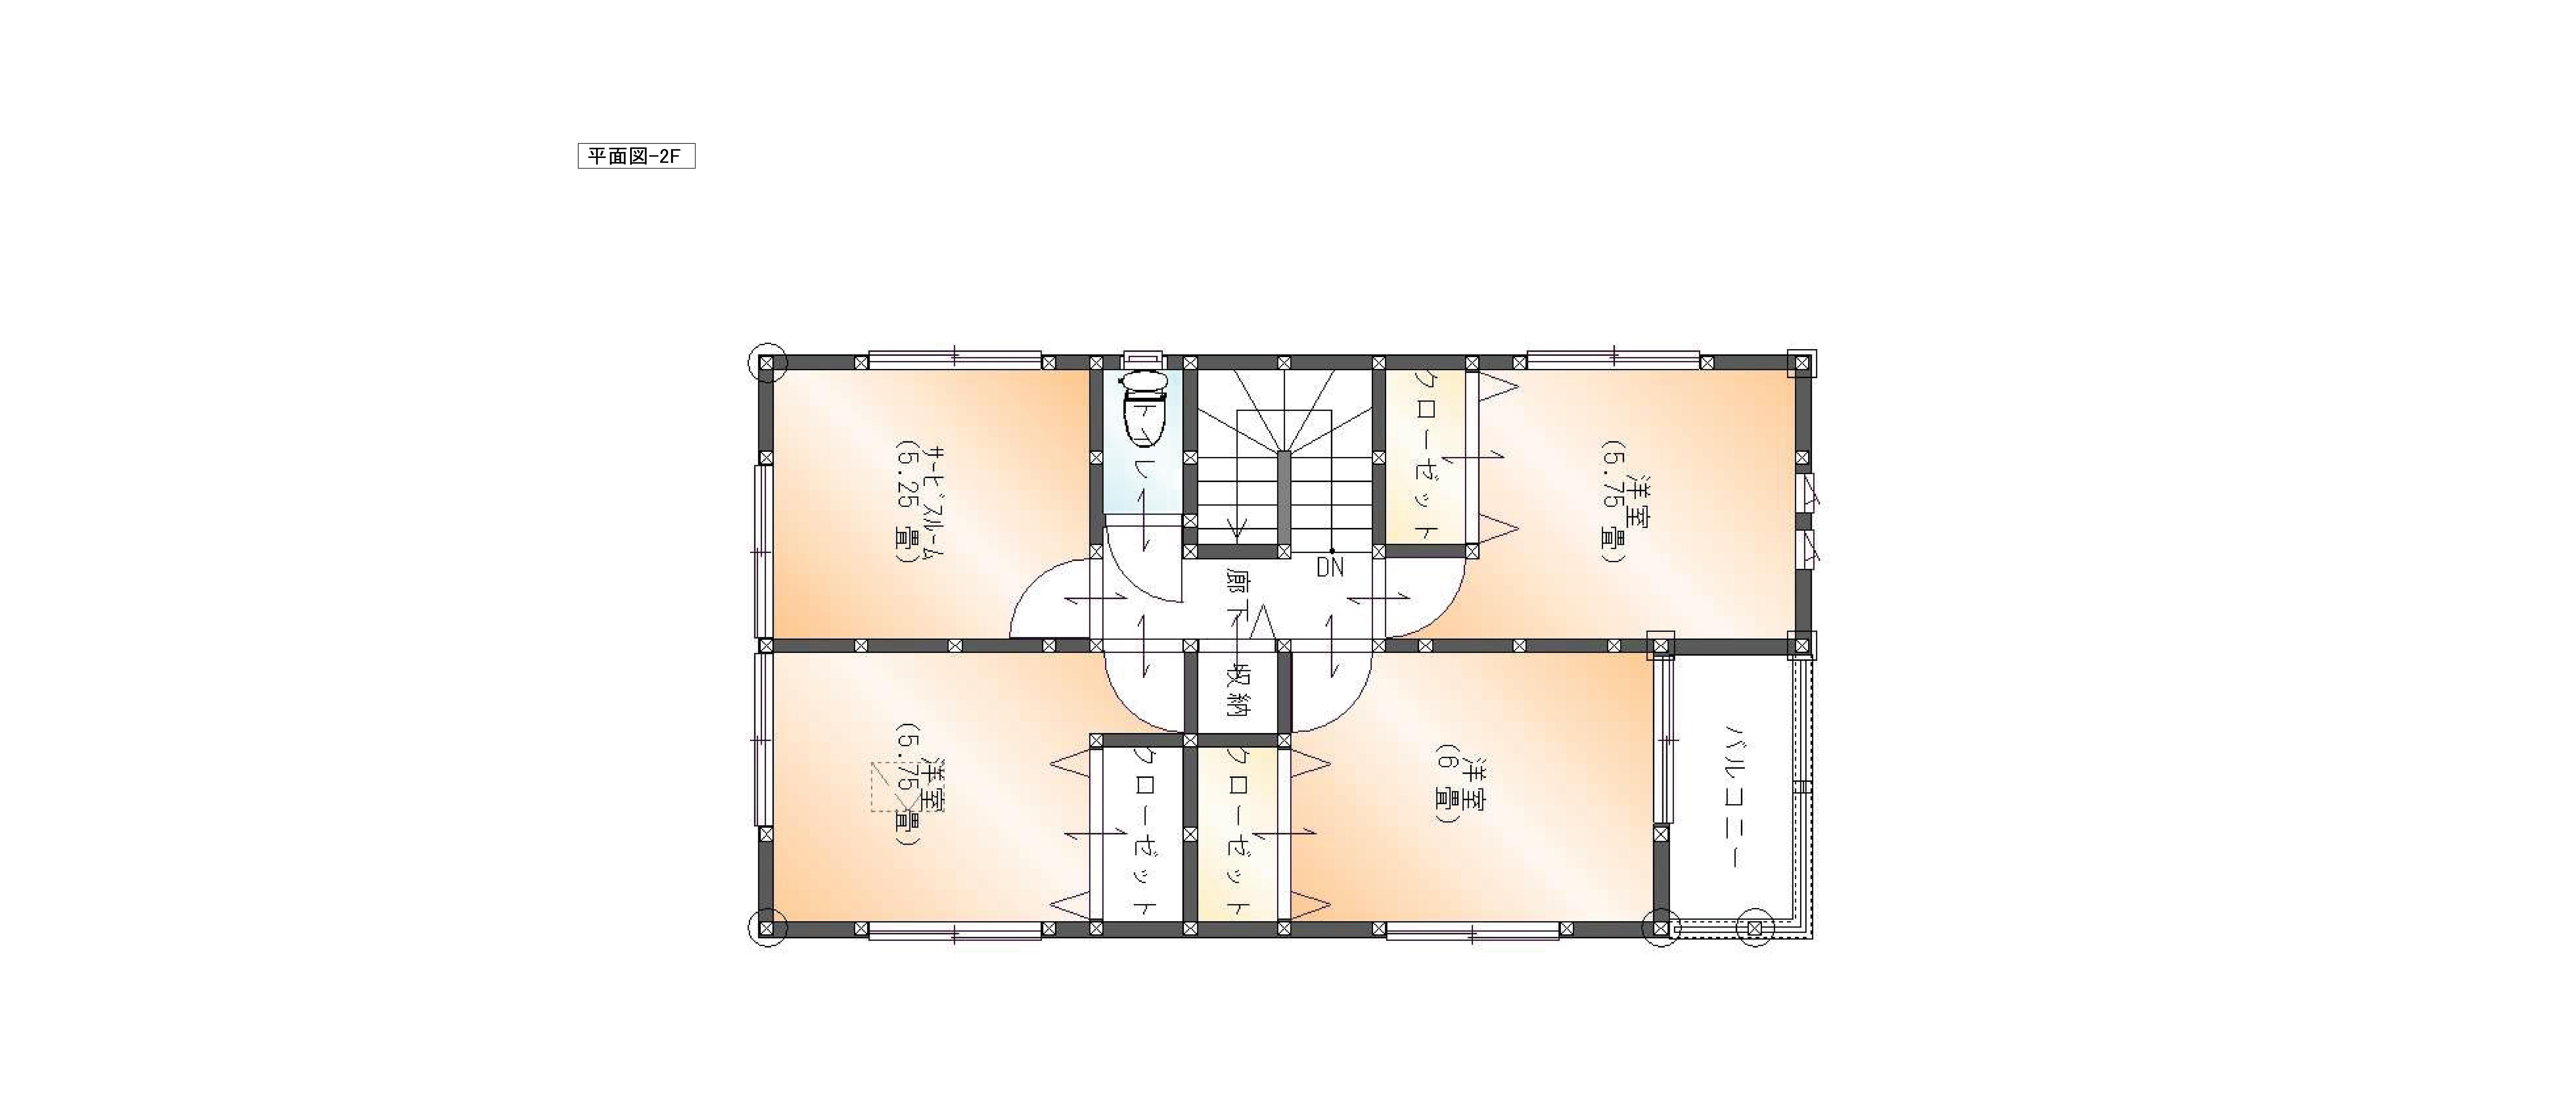 fudo楽々園プロジェクト2【木造2階建て・3LDK+S・2020年3月下旬完成予定】